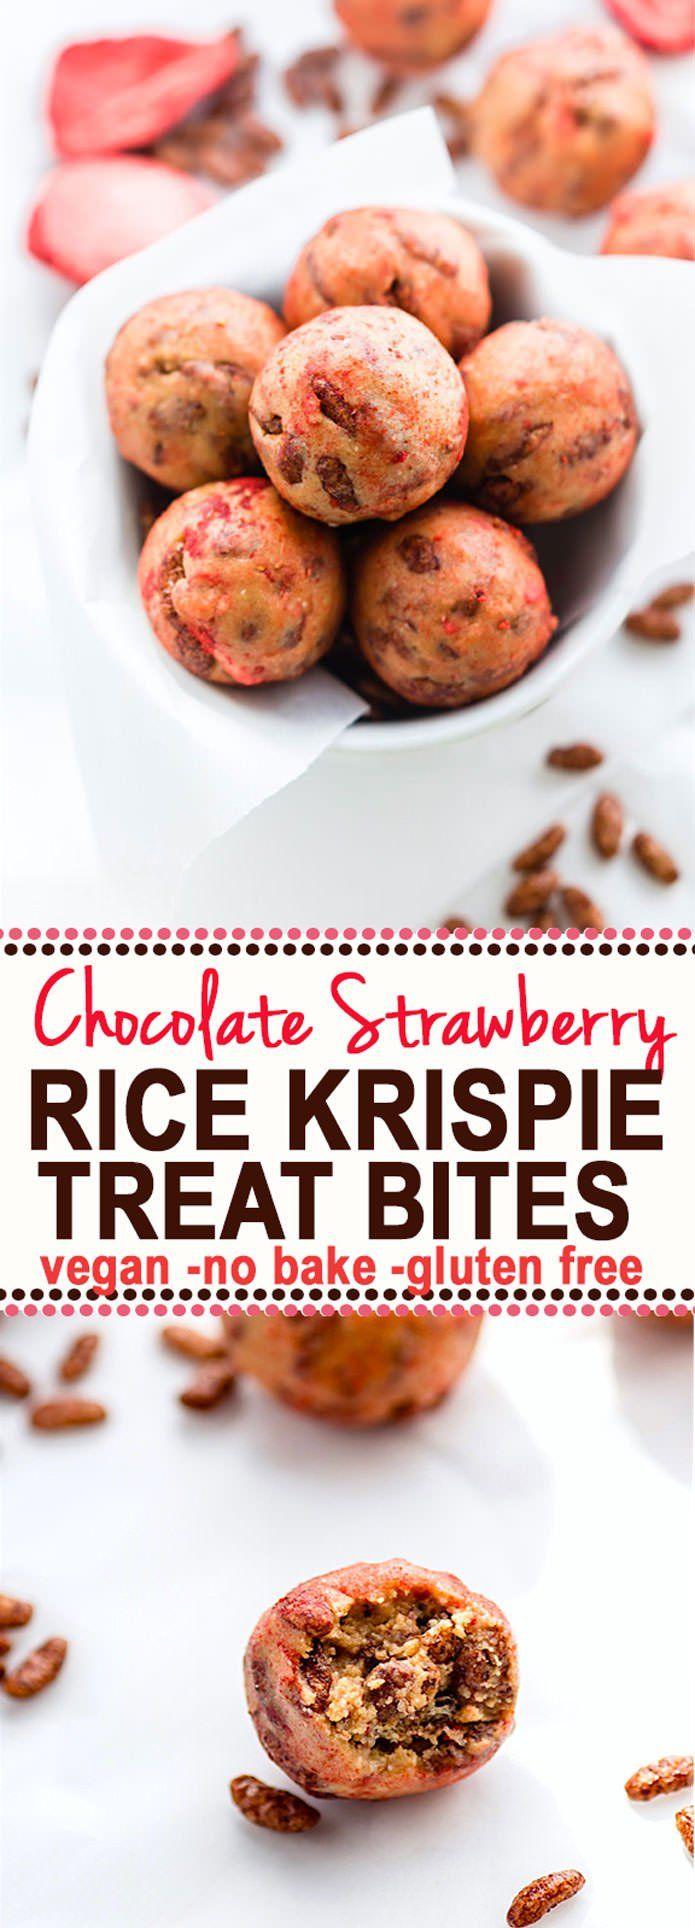 BAKE rice Krispie Treats BITES! Vegan Gluten Free Rice Krispie treats ...